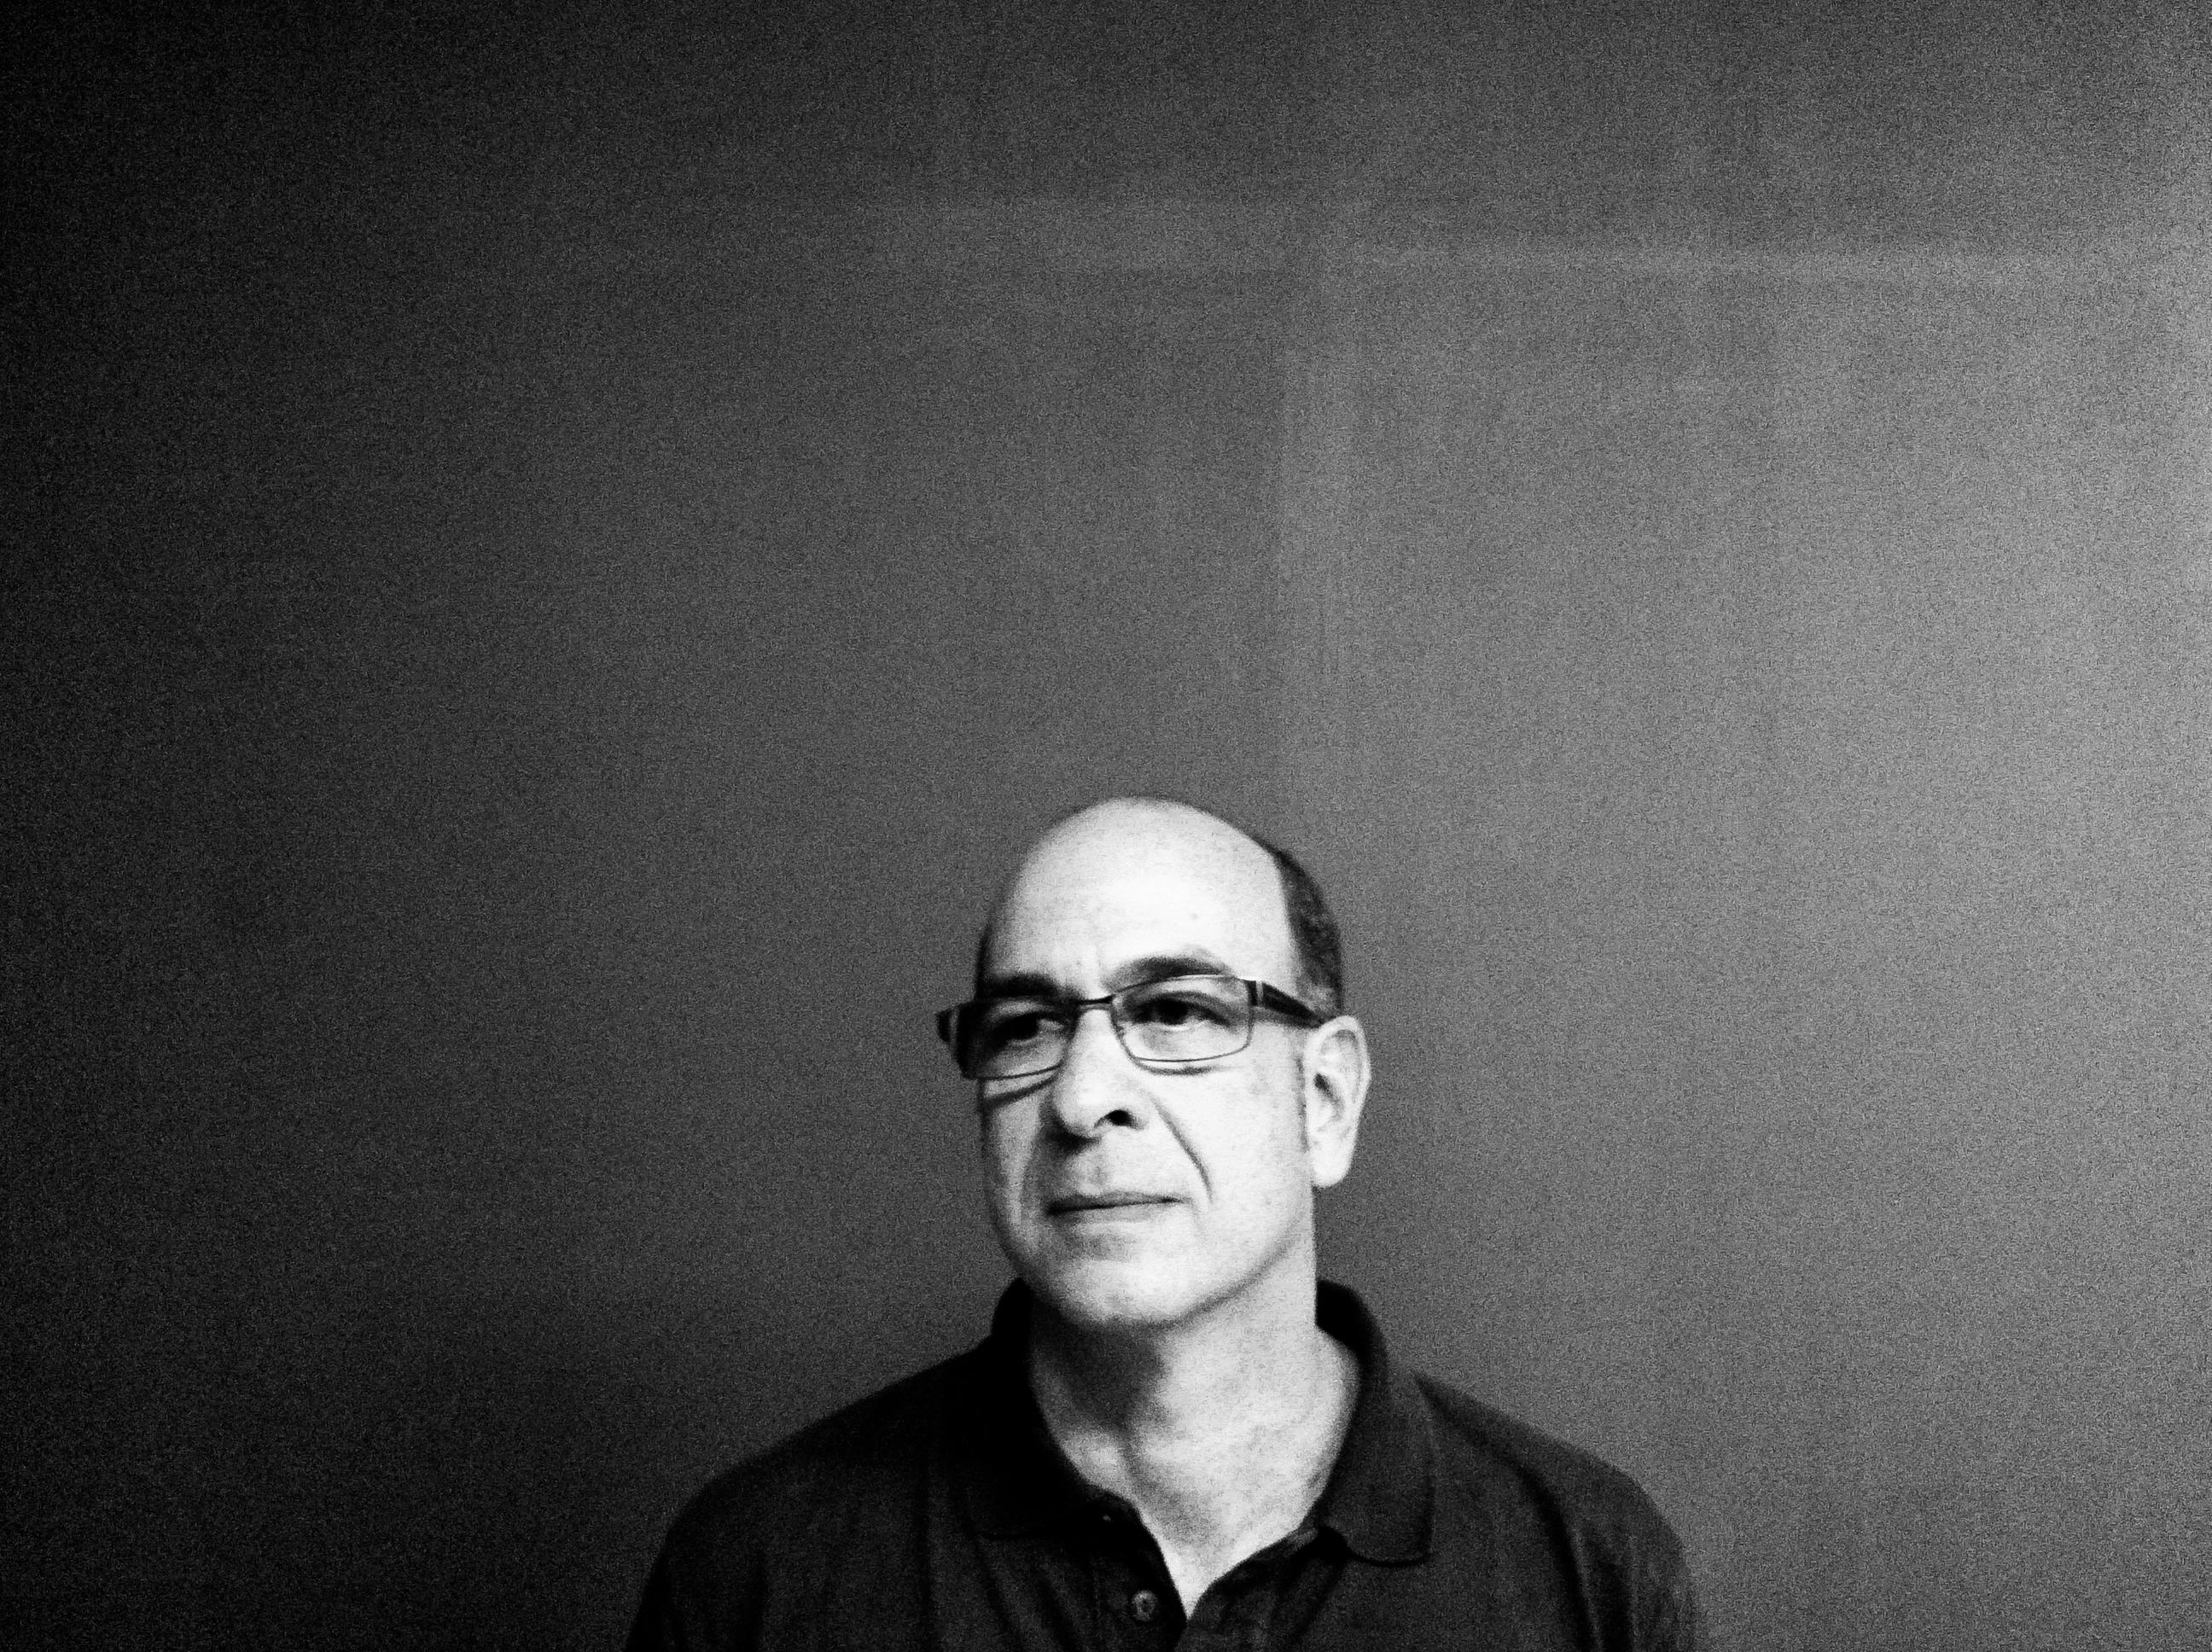 Antonio Fatorelli | Pri Buhr